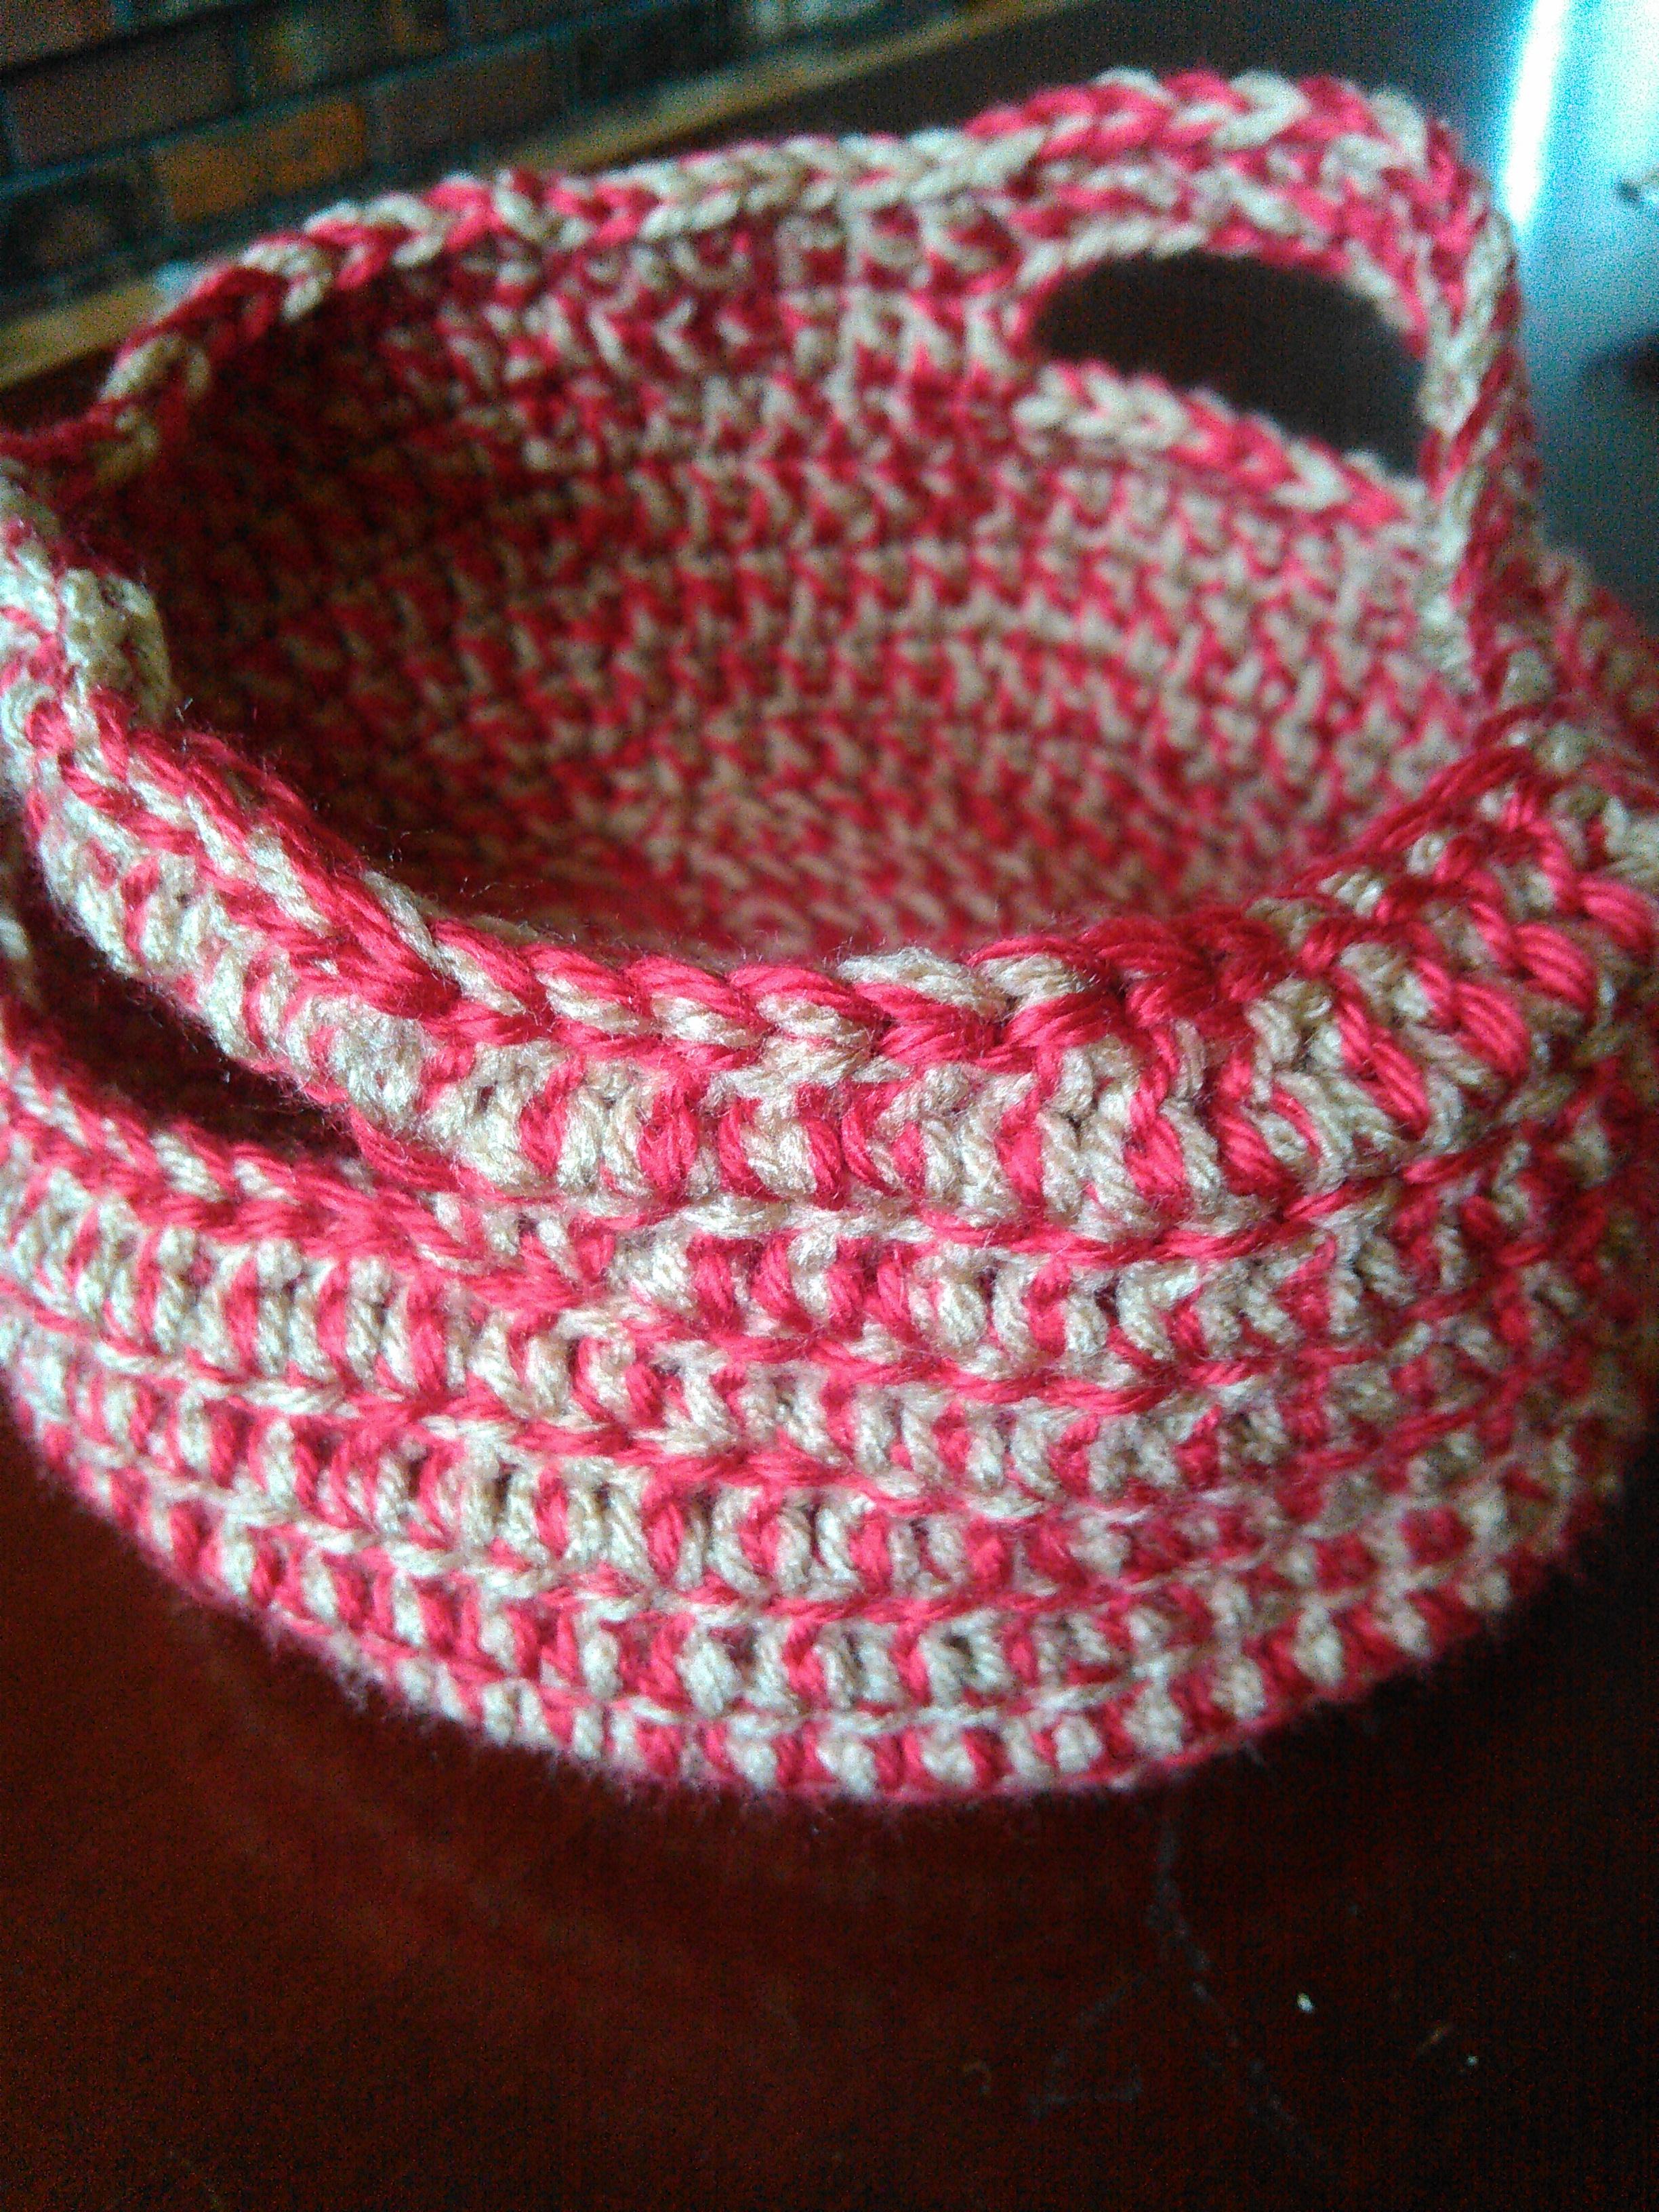 Crochet Round Basket (free pattern)